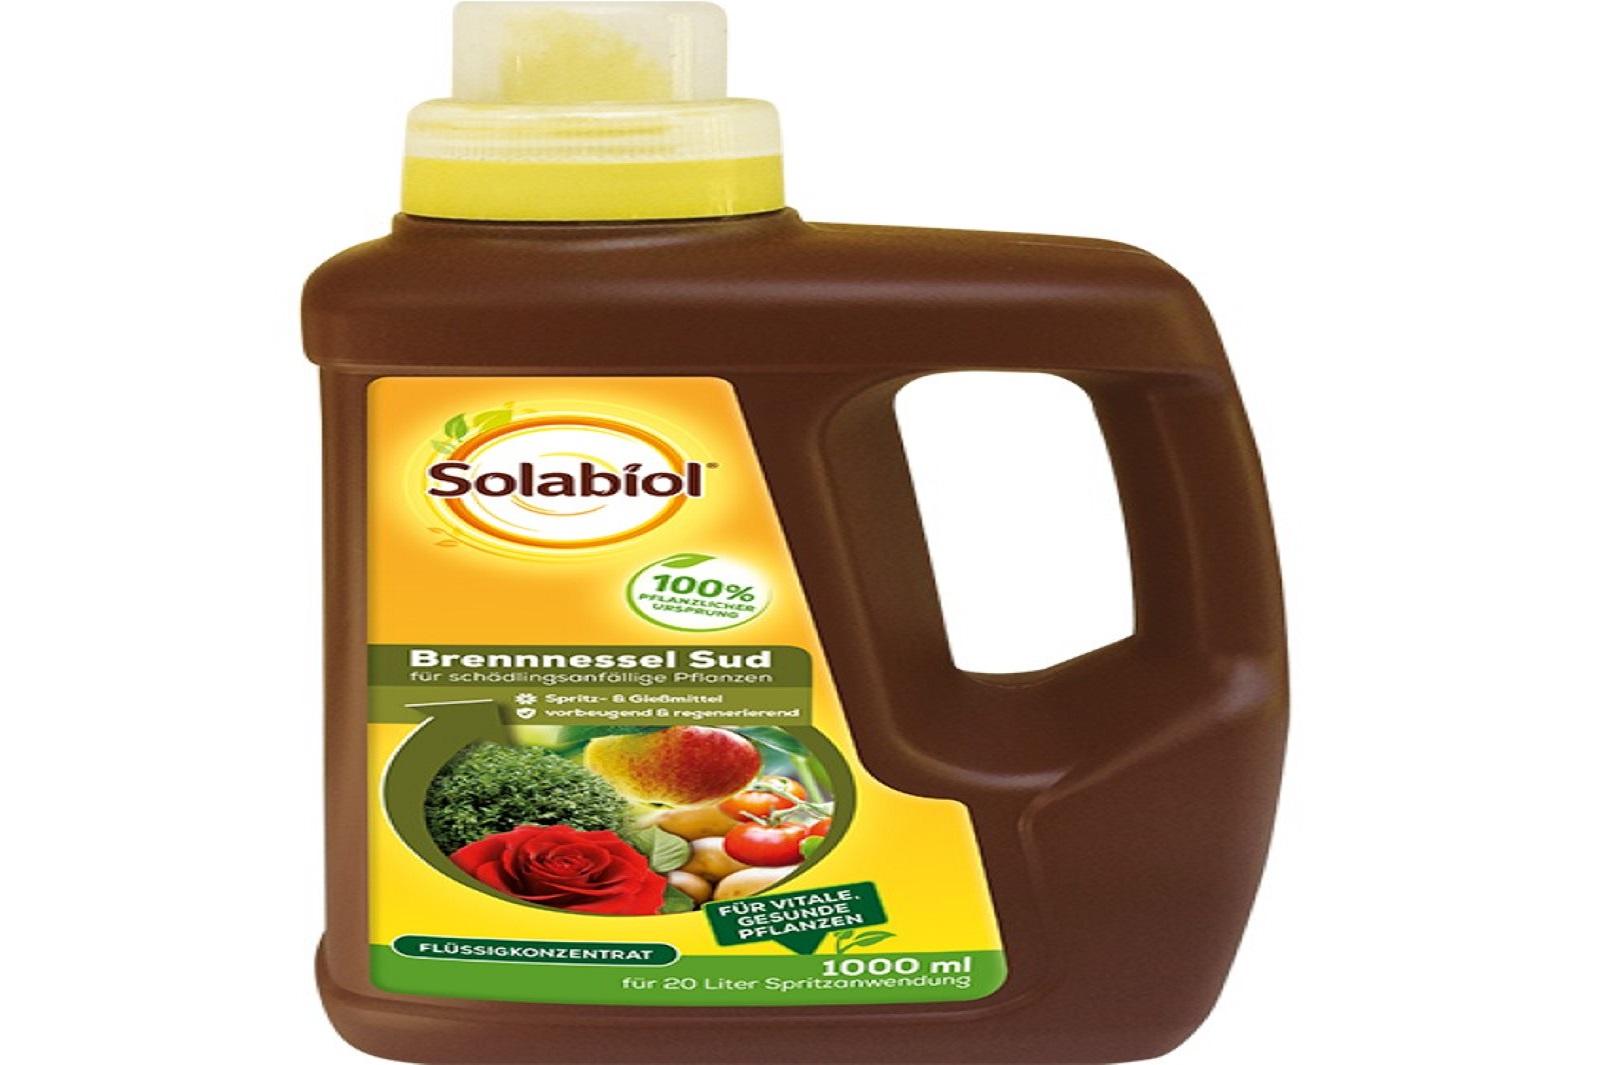 Solabiol Brennnessel Sud 1 Liter